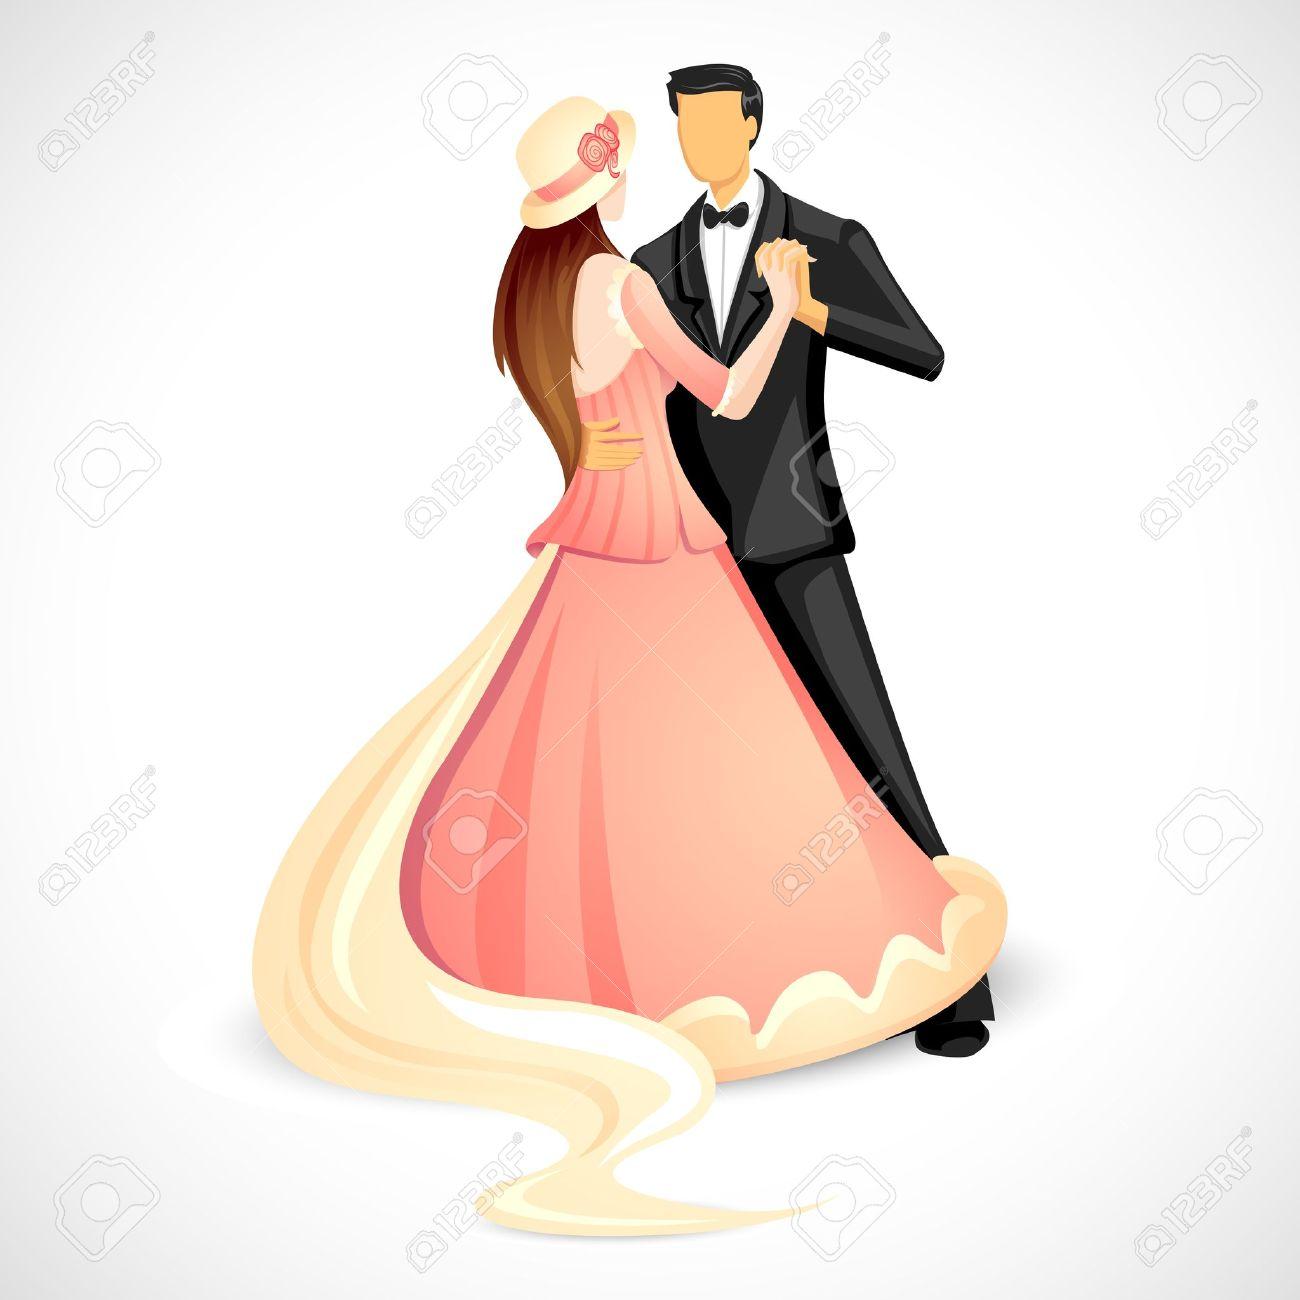 hight resolution of 1300x1300 danse clipart wedding couple